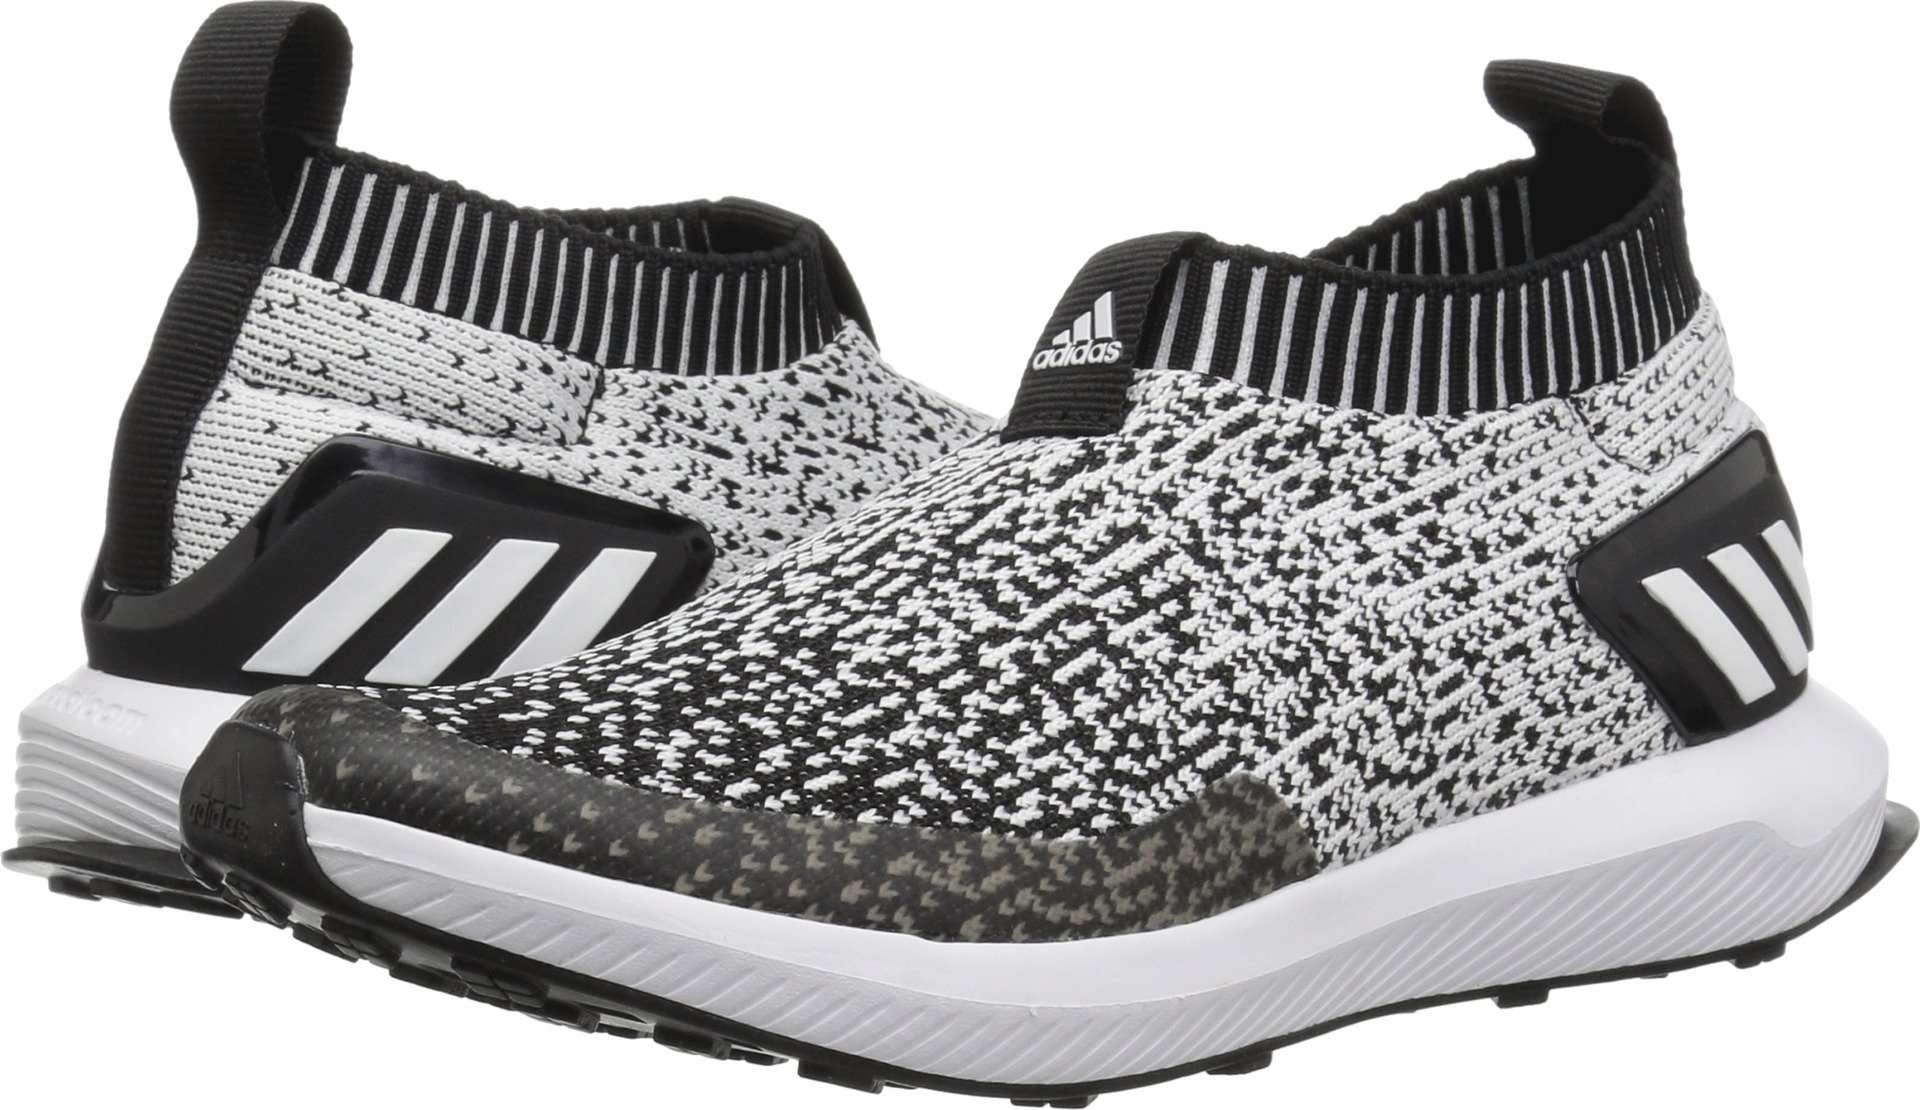 b4bcd022a0 adidas Unisex RapidaRun Laceless Running Shoe, White/Black, 10.5K M US  Little Kid